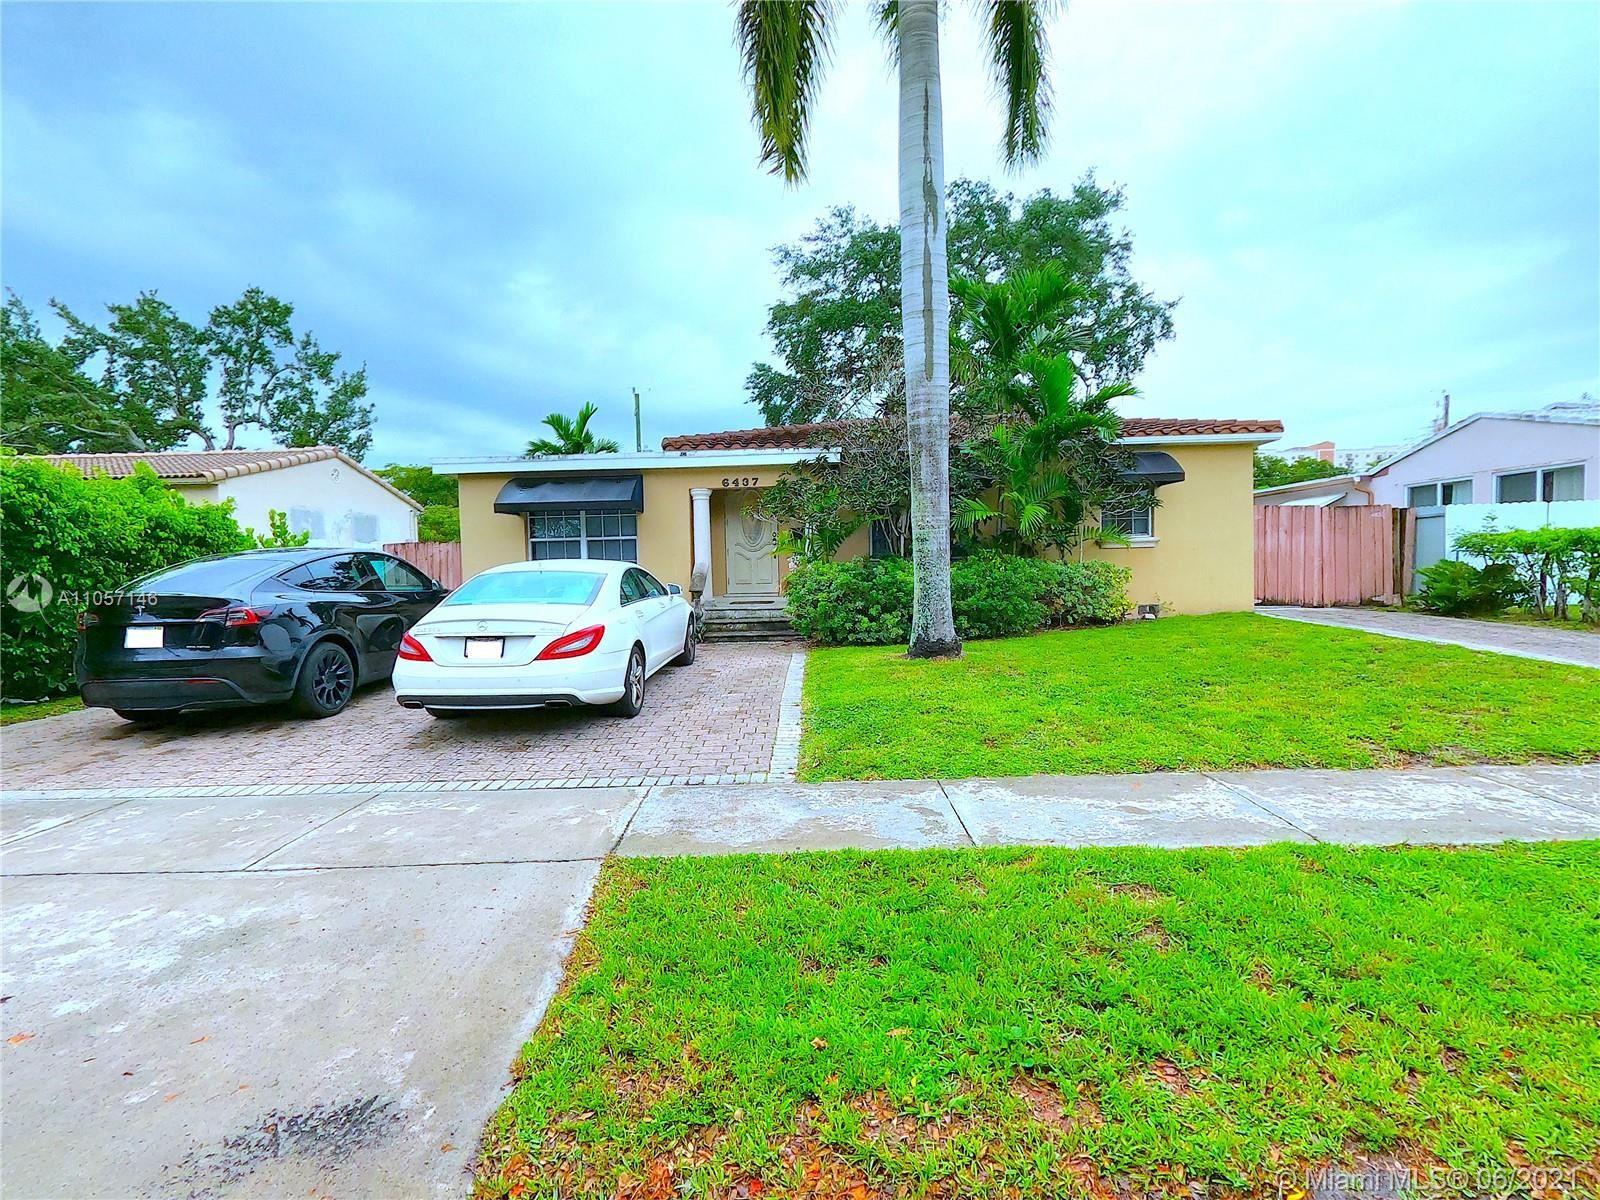 6437 SW 10th Ter, West Miami, FL 33144 - #: A11057146